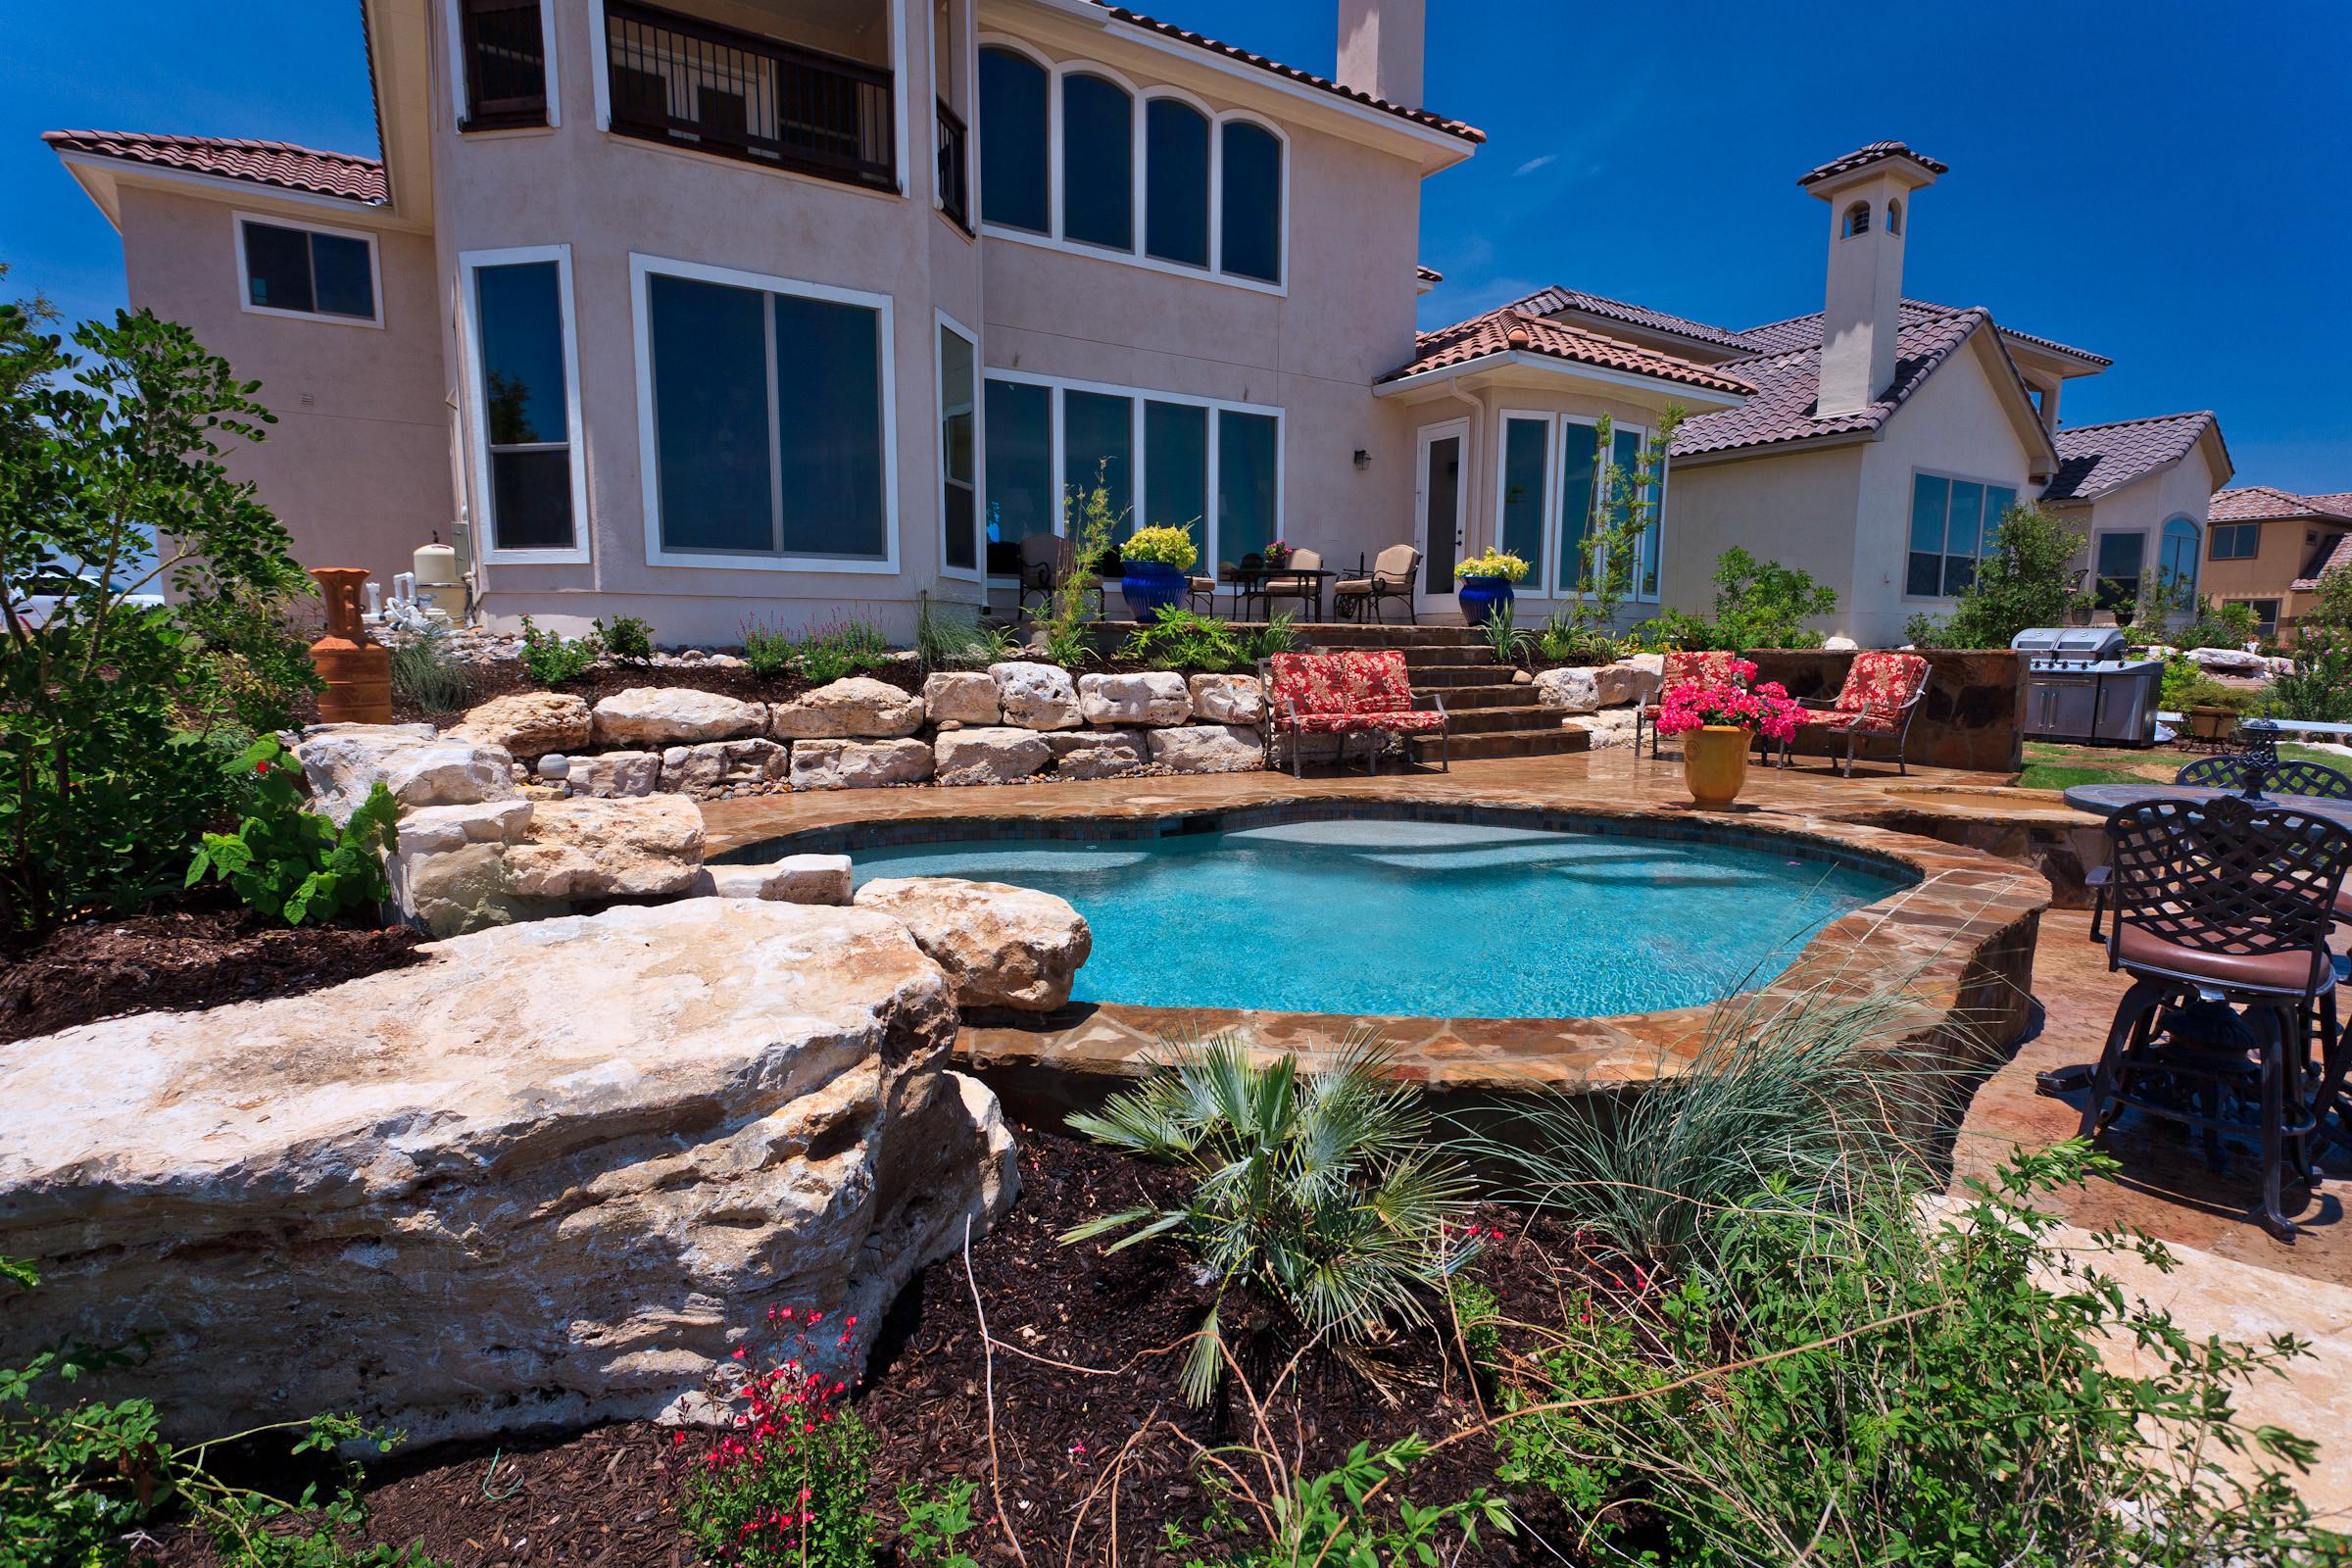 San Antonio Plunge Pool